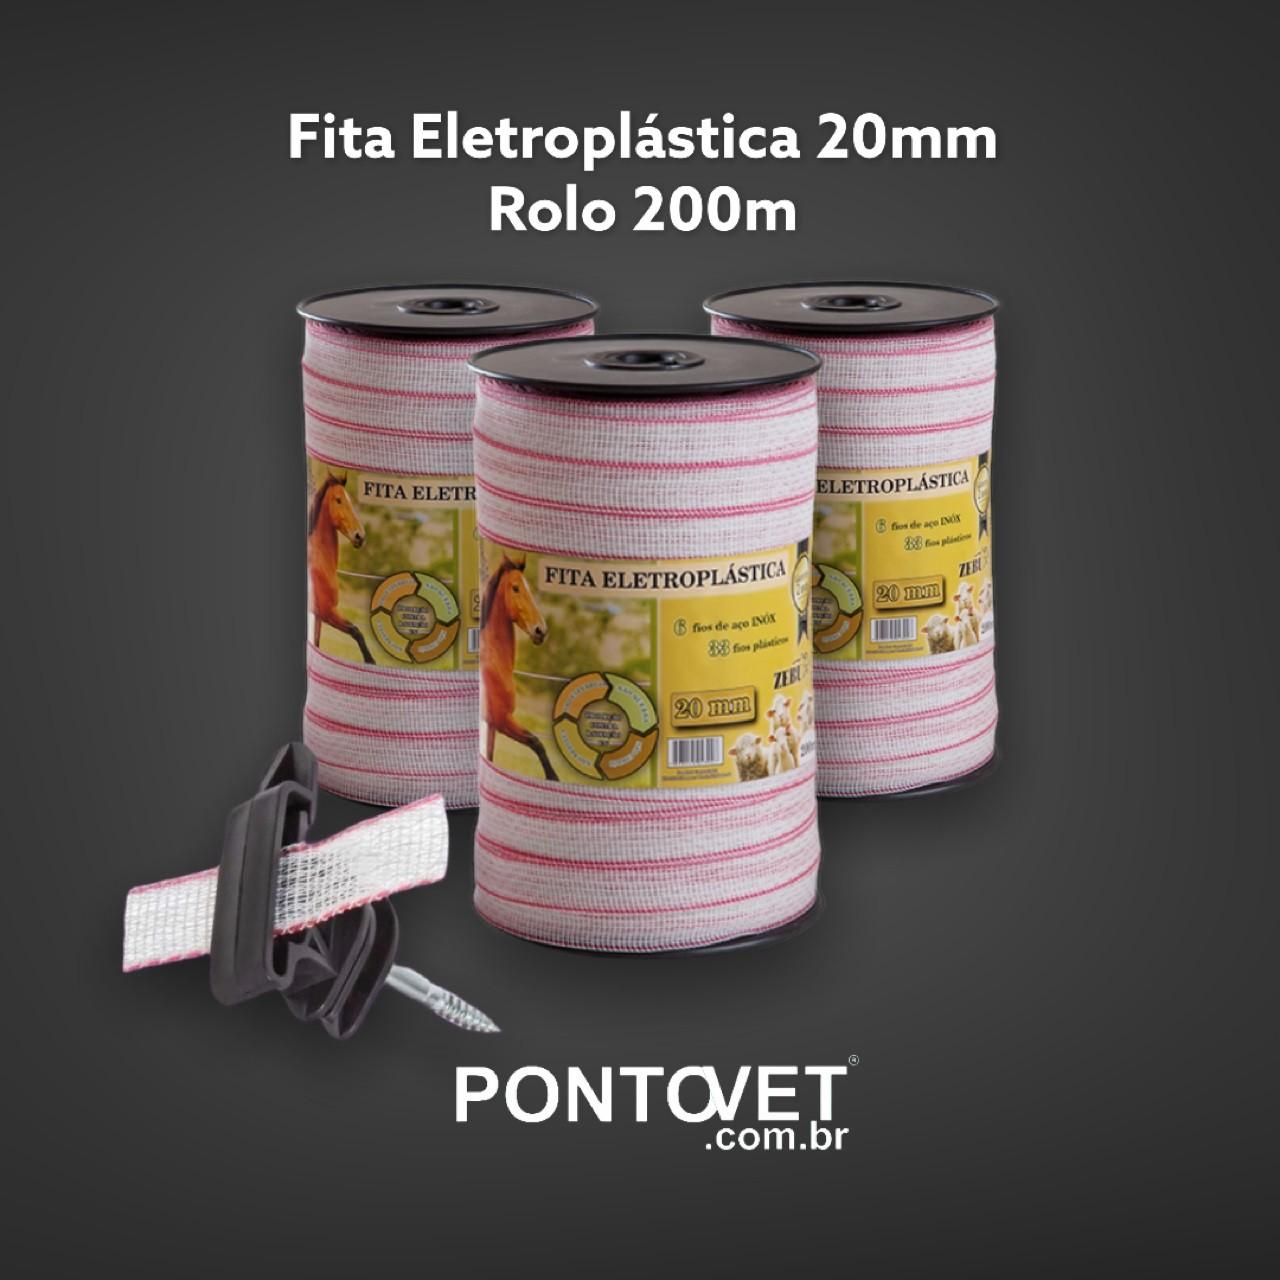 Fita Eletroplástica 20mm (Rolo 200m)